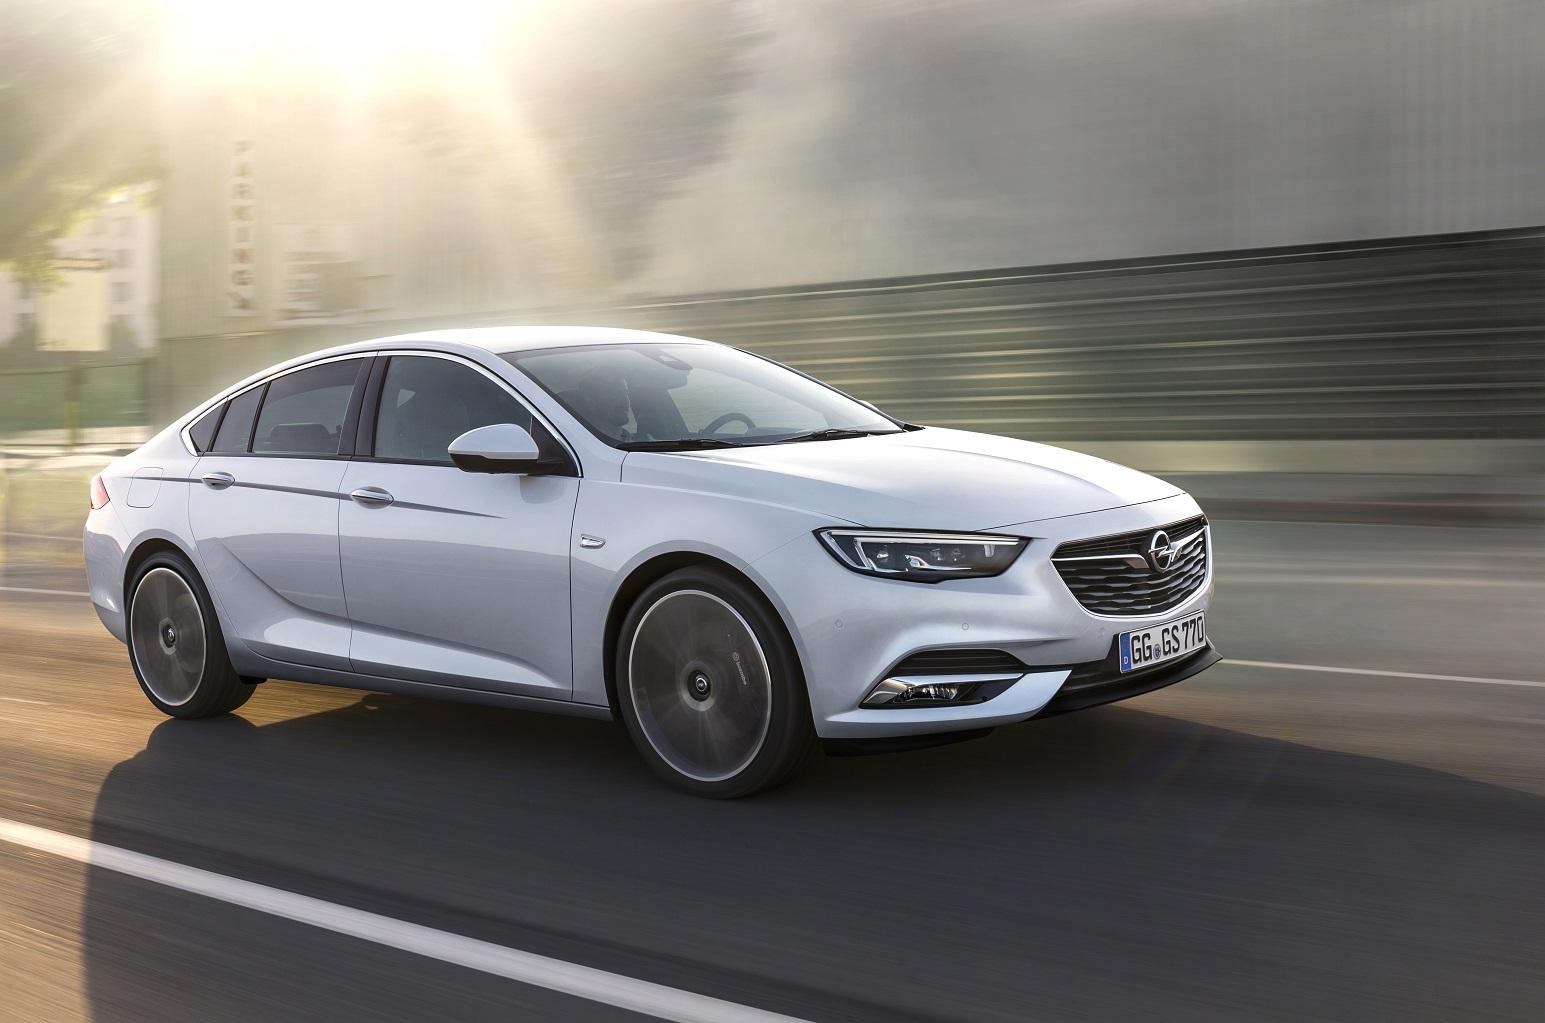 Opel Insignia Grand Sport 2017: una berlina coupé atlética y elegante